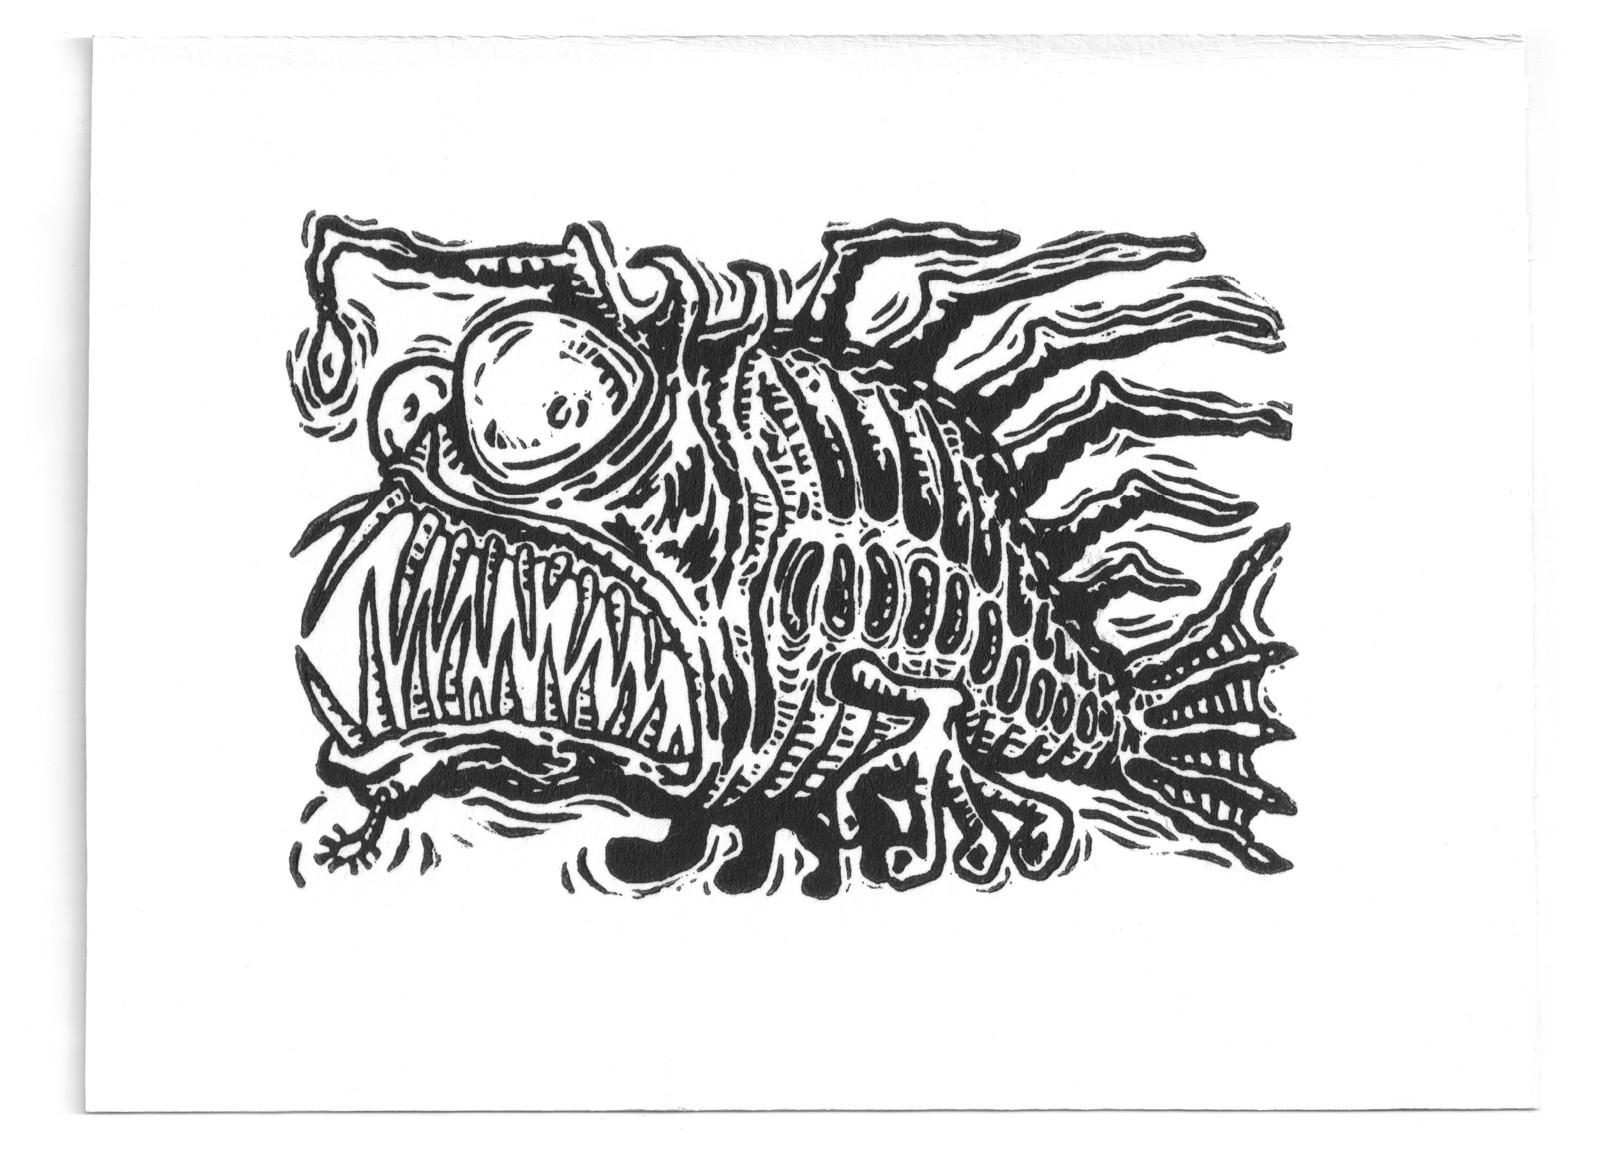 schizofish-linocut-martin-marcin-reznik-